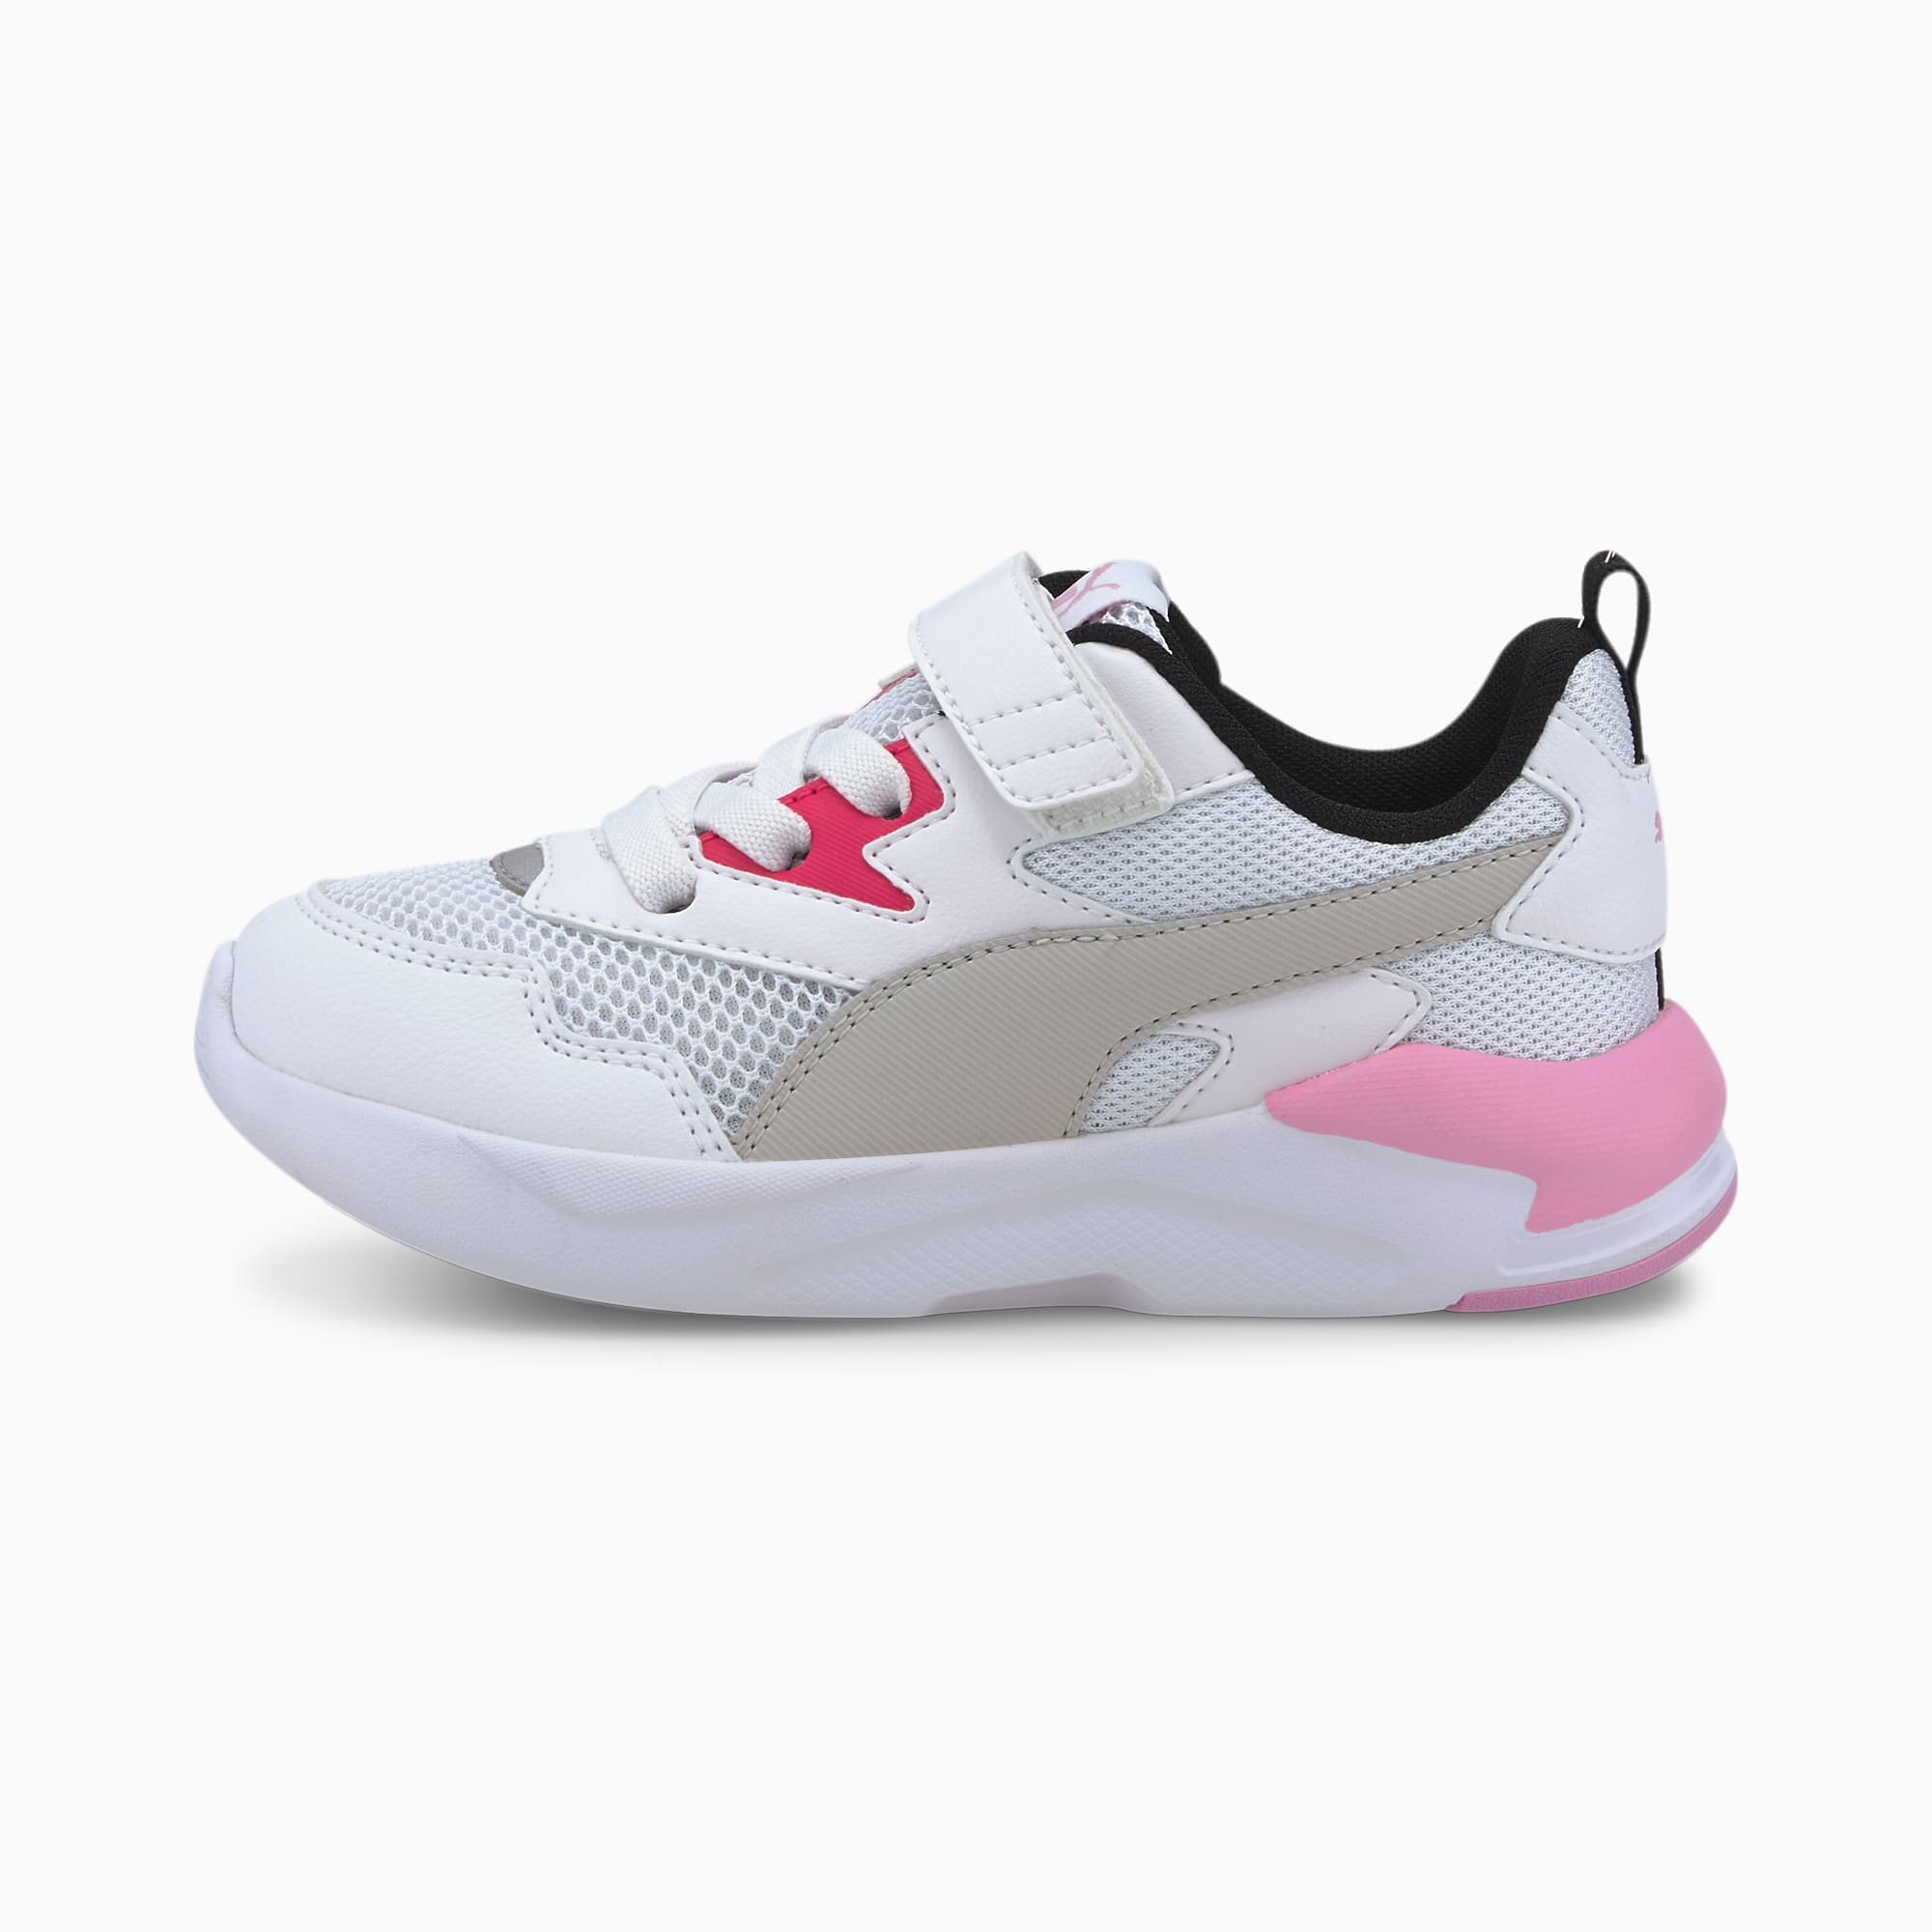 X-Ray Lite IMEVA Kids' Shoes   White-Gray-Pink-Black-Silver   PUMA Kids    PUMA